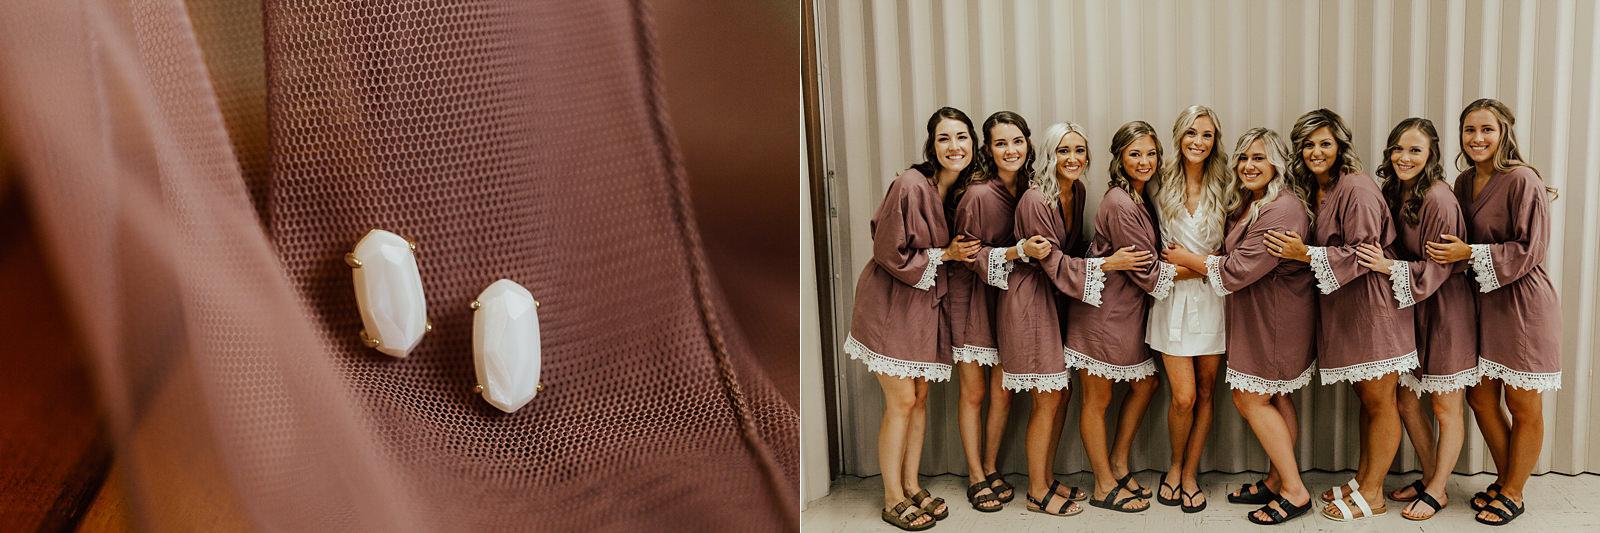 Molly & Bradley Modern Boho Wedding at The University Club Quad Cities-3.jpg